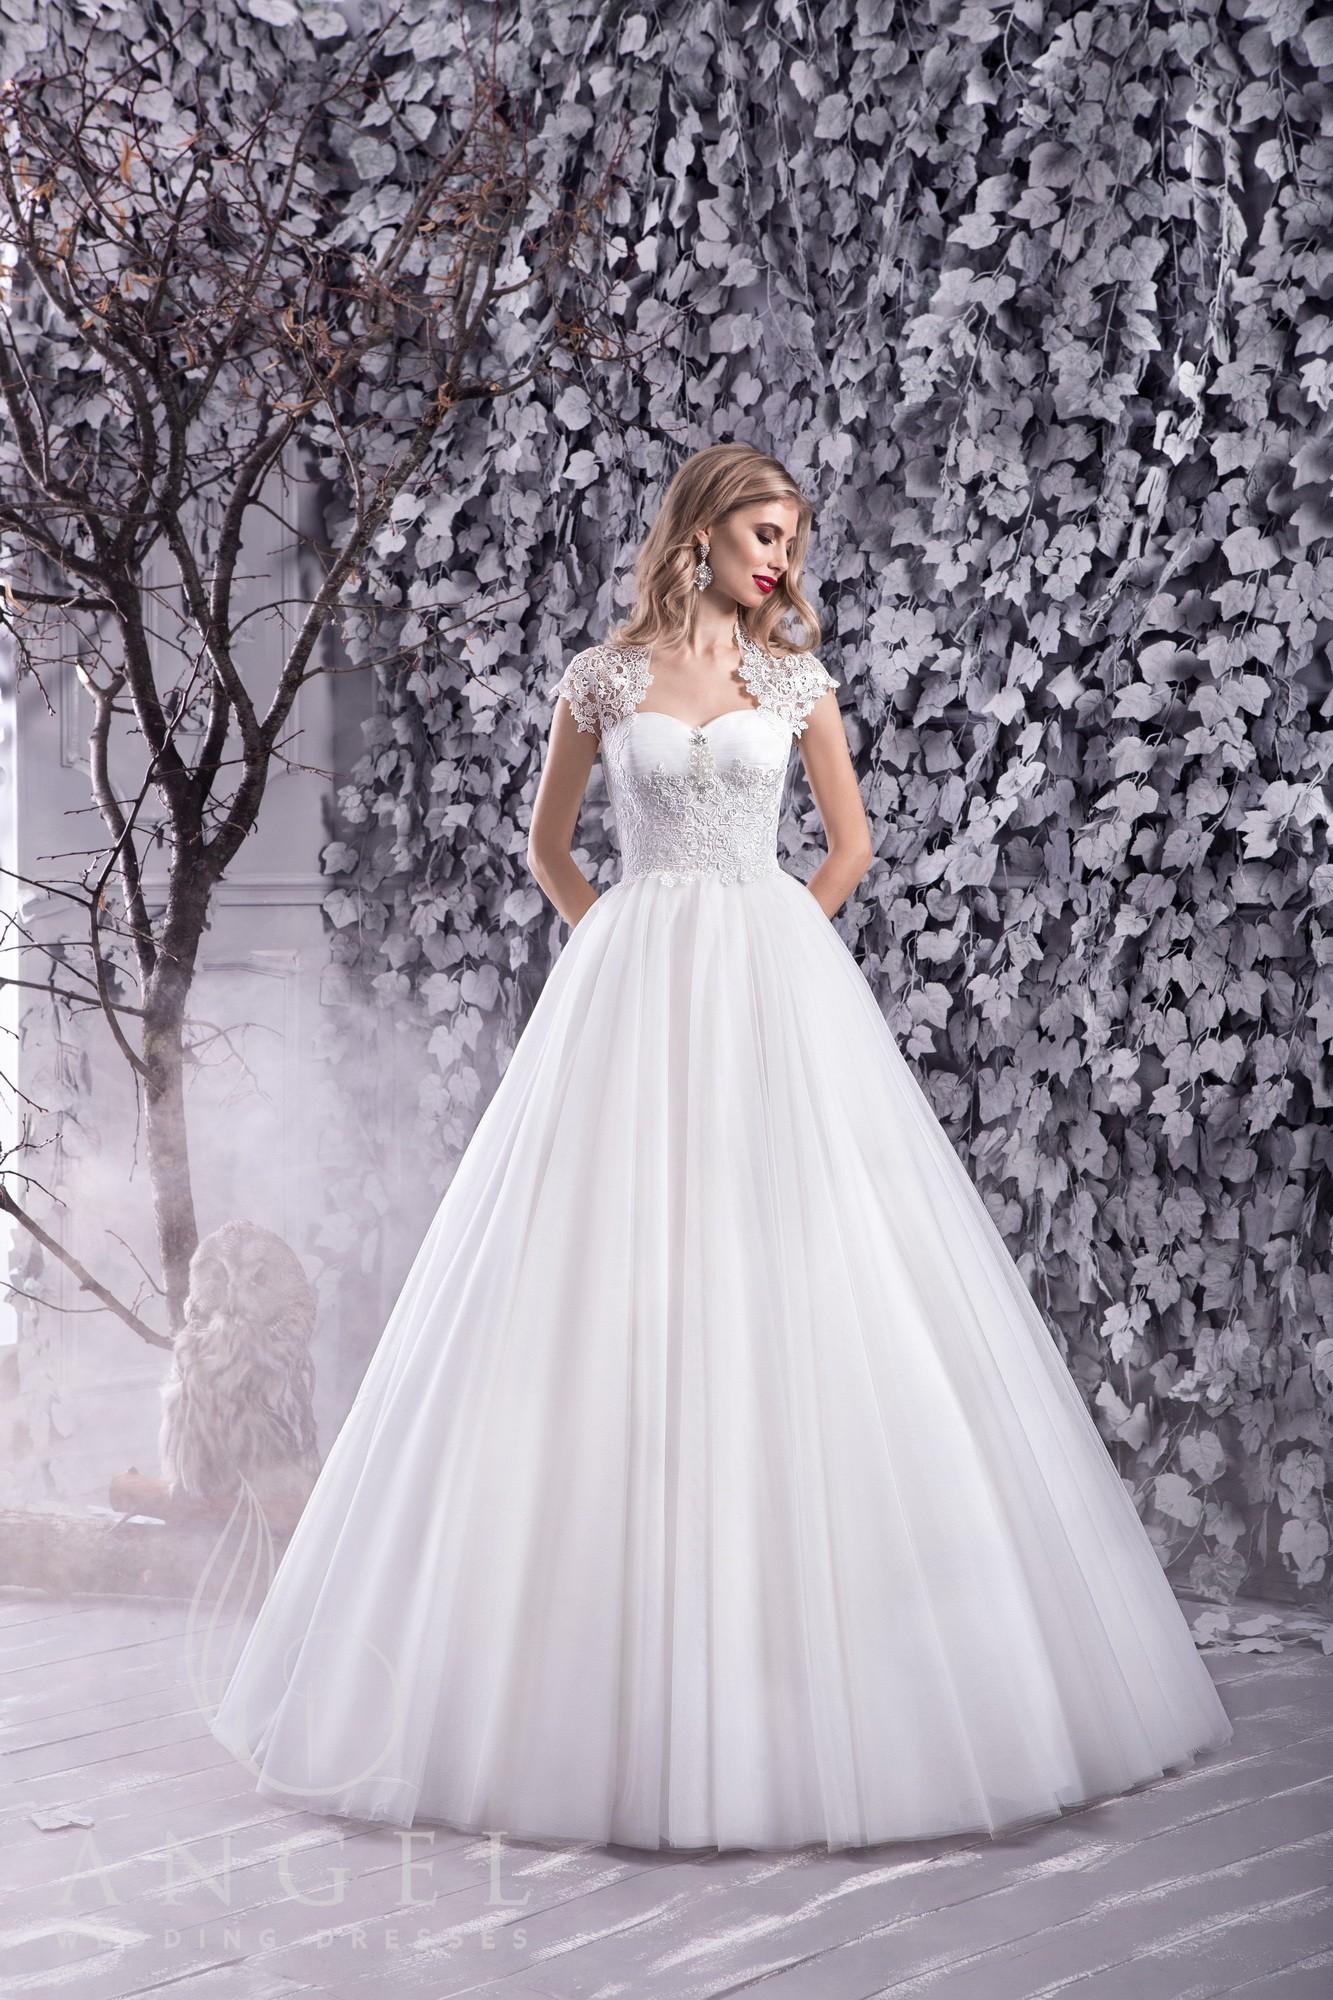 https://angel-novias.com/images/stories/virtuemart/product/KARA.jpg